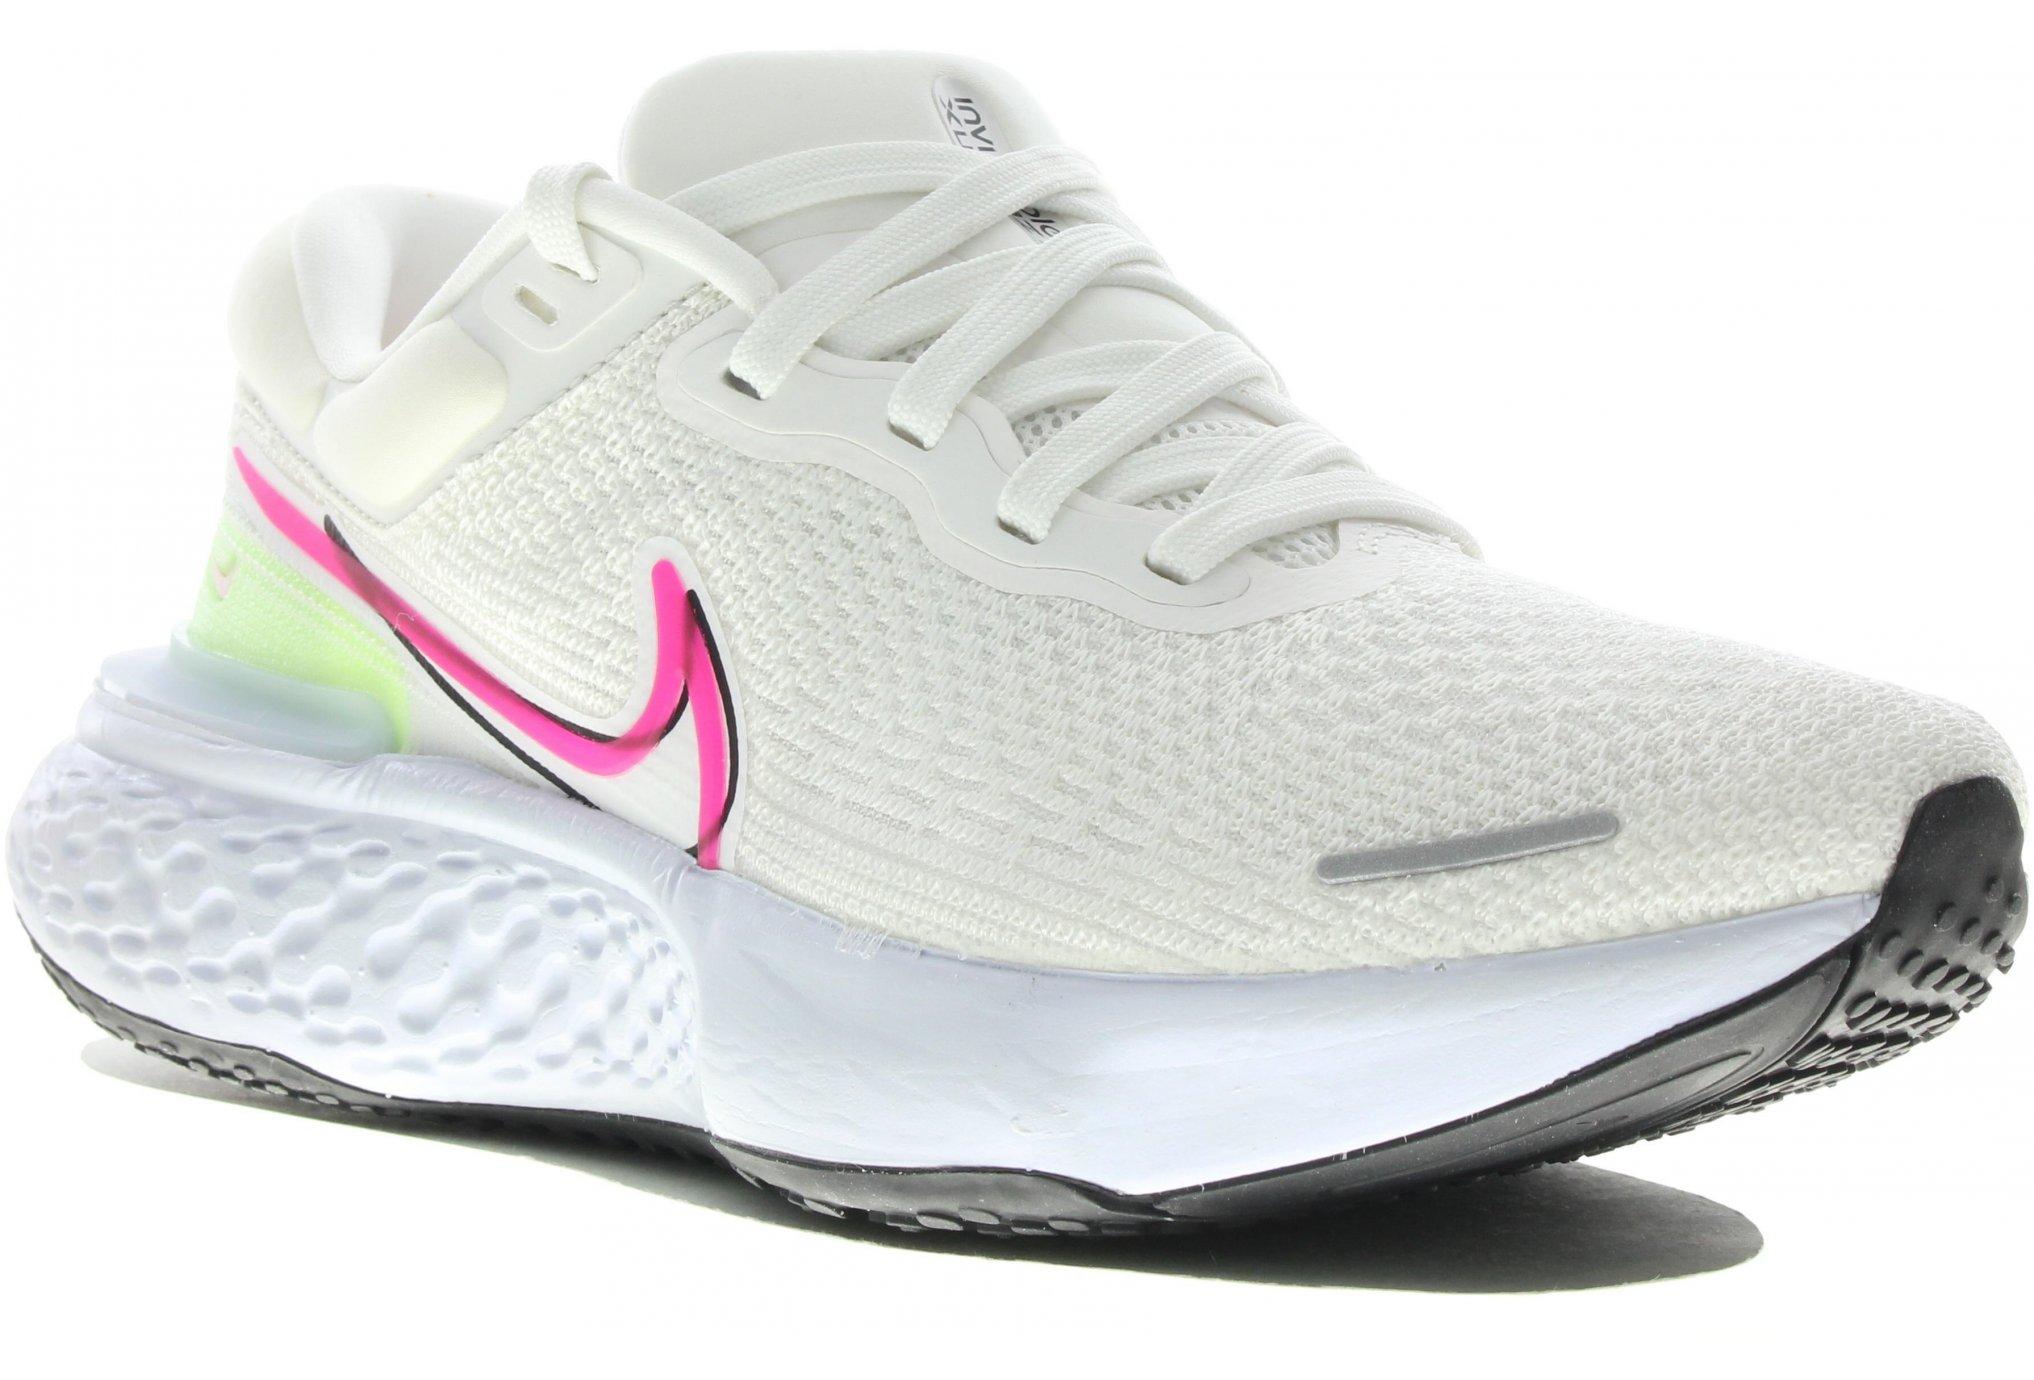 Nike ZoomX Invincible Run Flyknit Rawdacious W Chaussures running femme